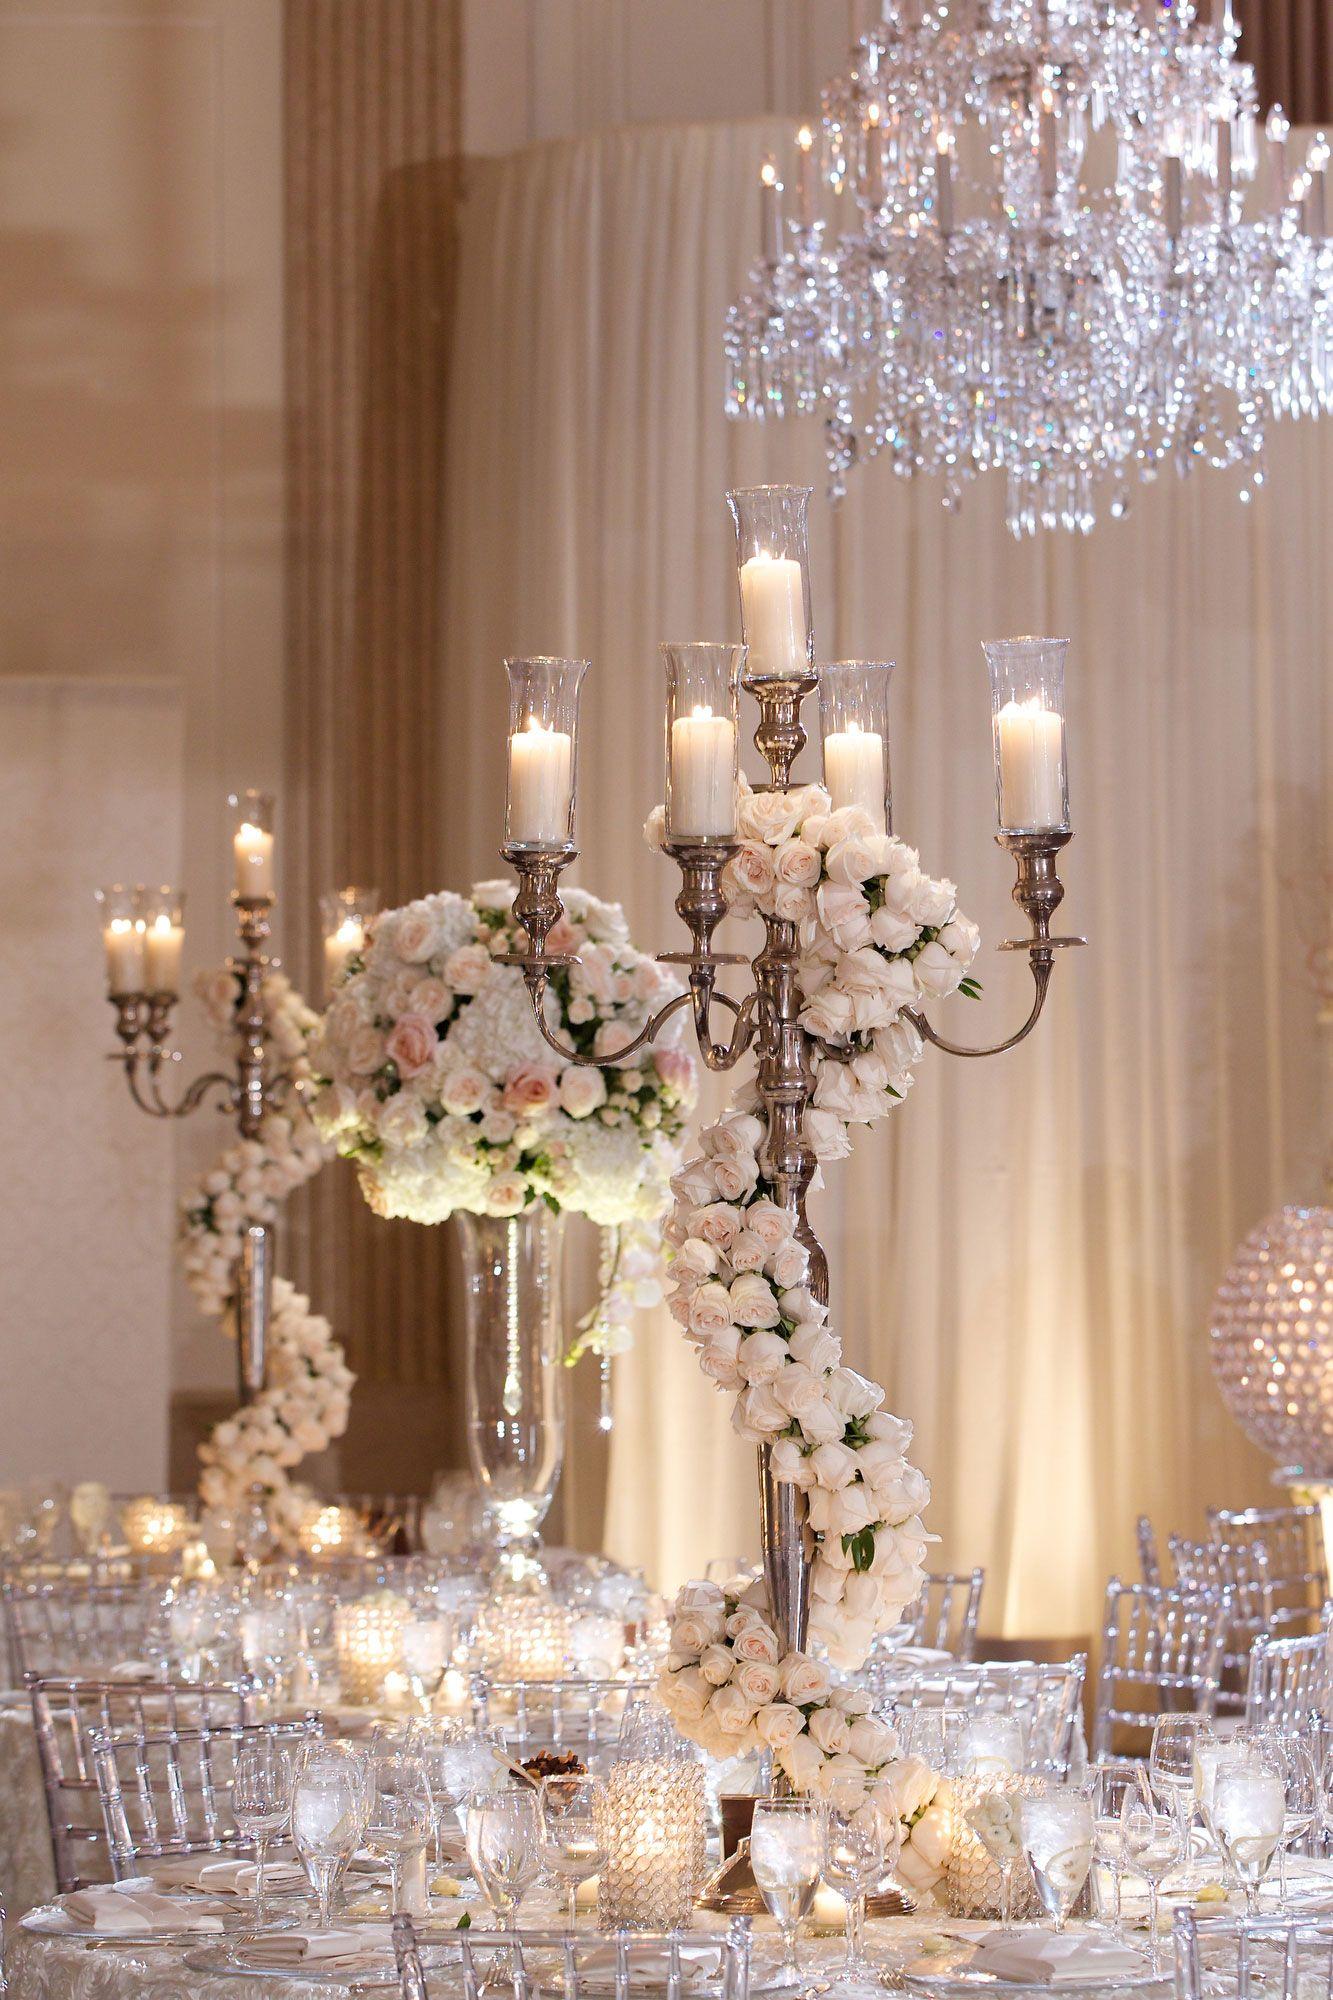 Dress Up A Candelabra Centerpiece With A Garland Of Flowers